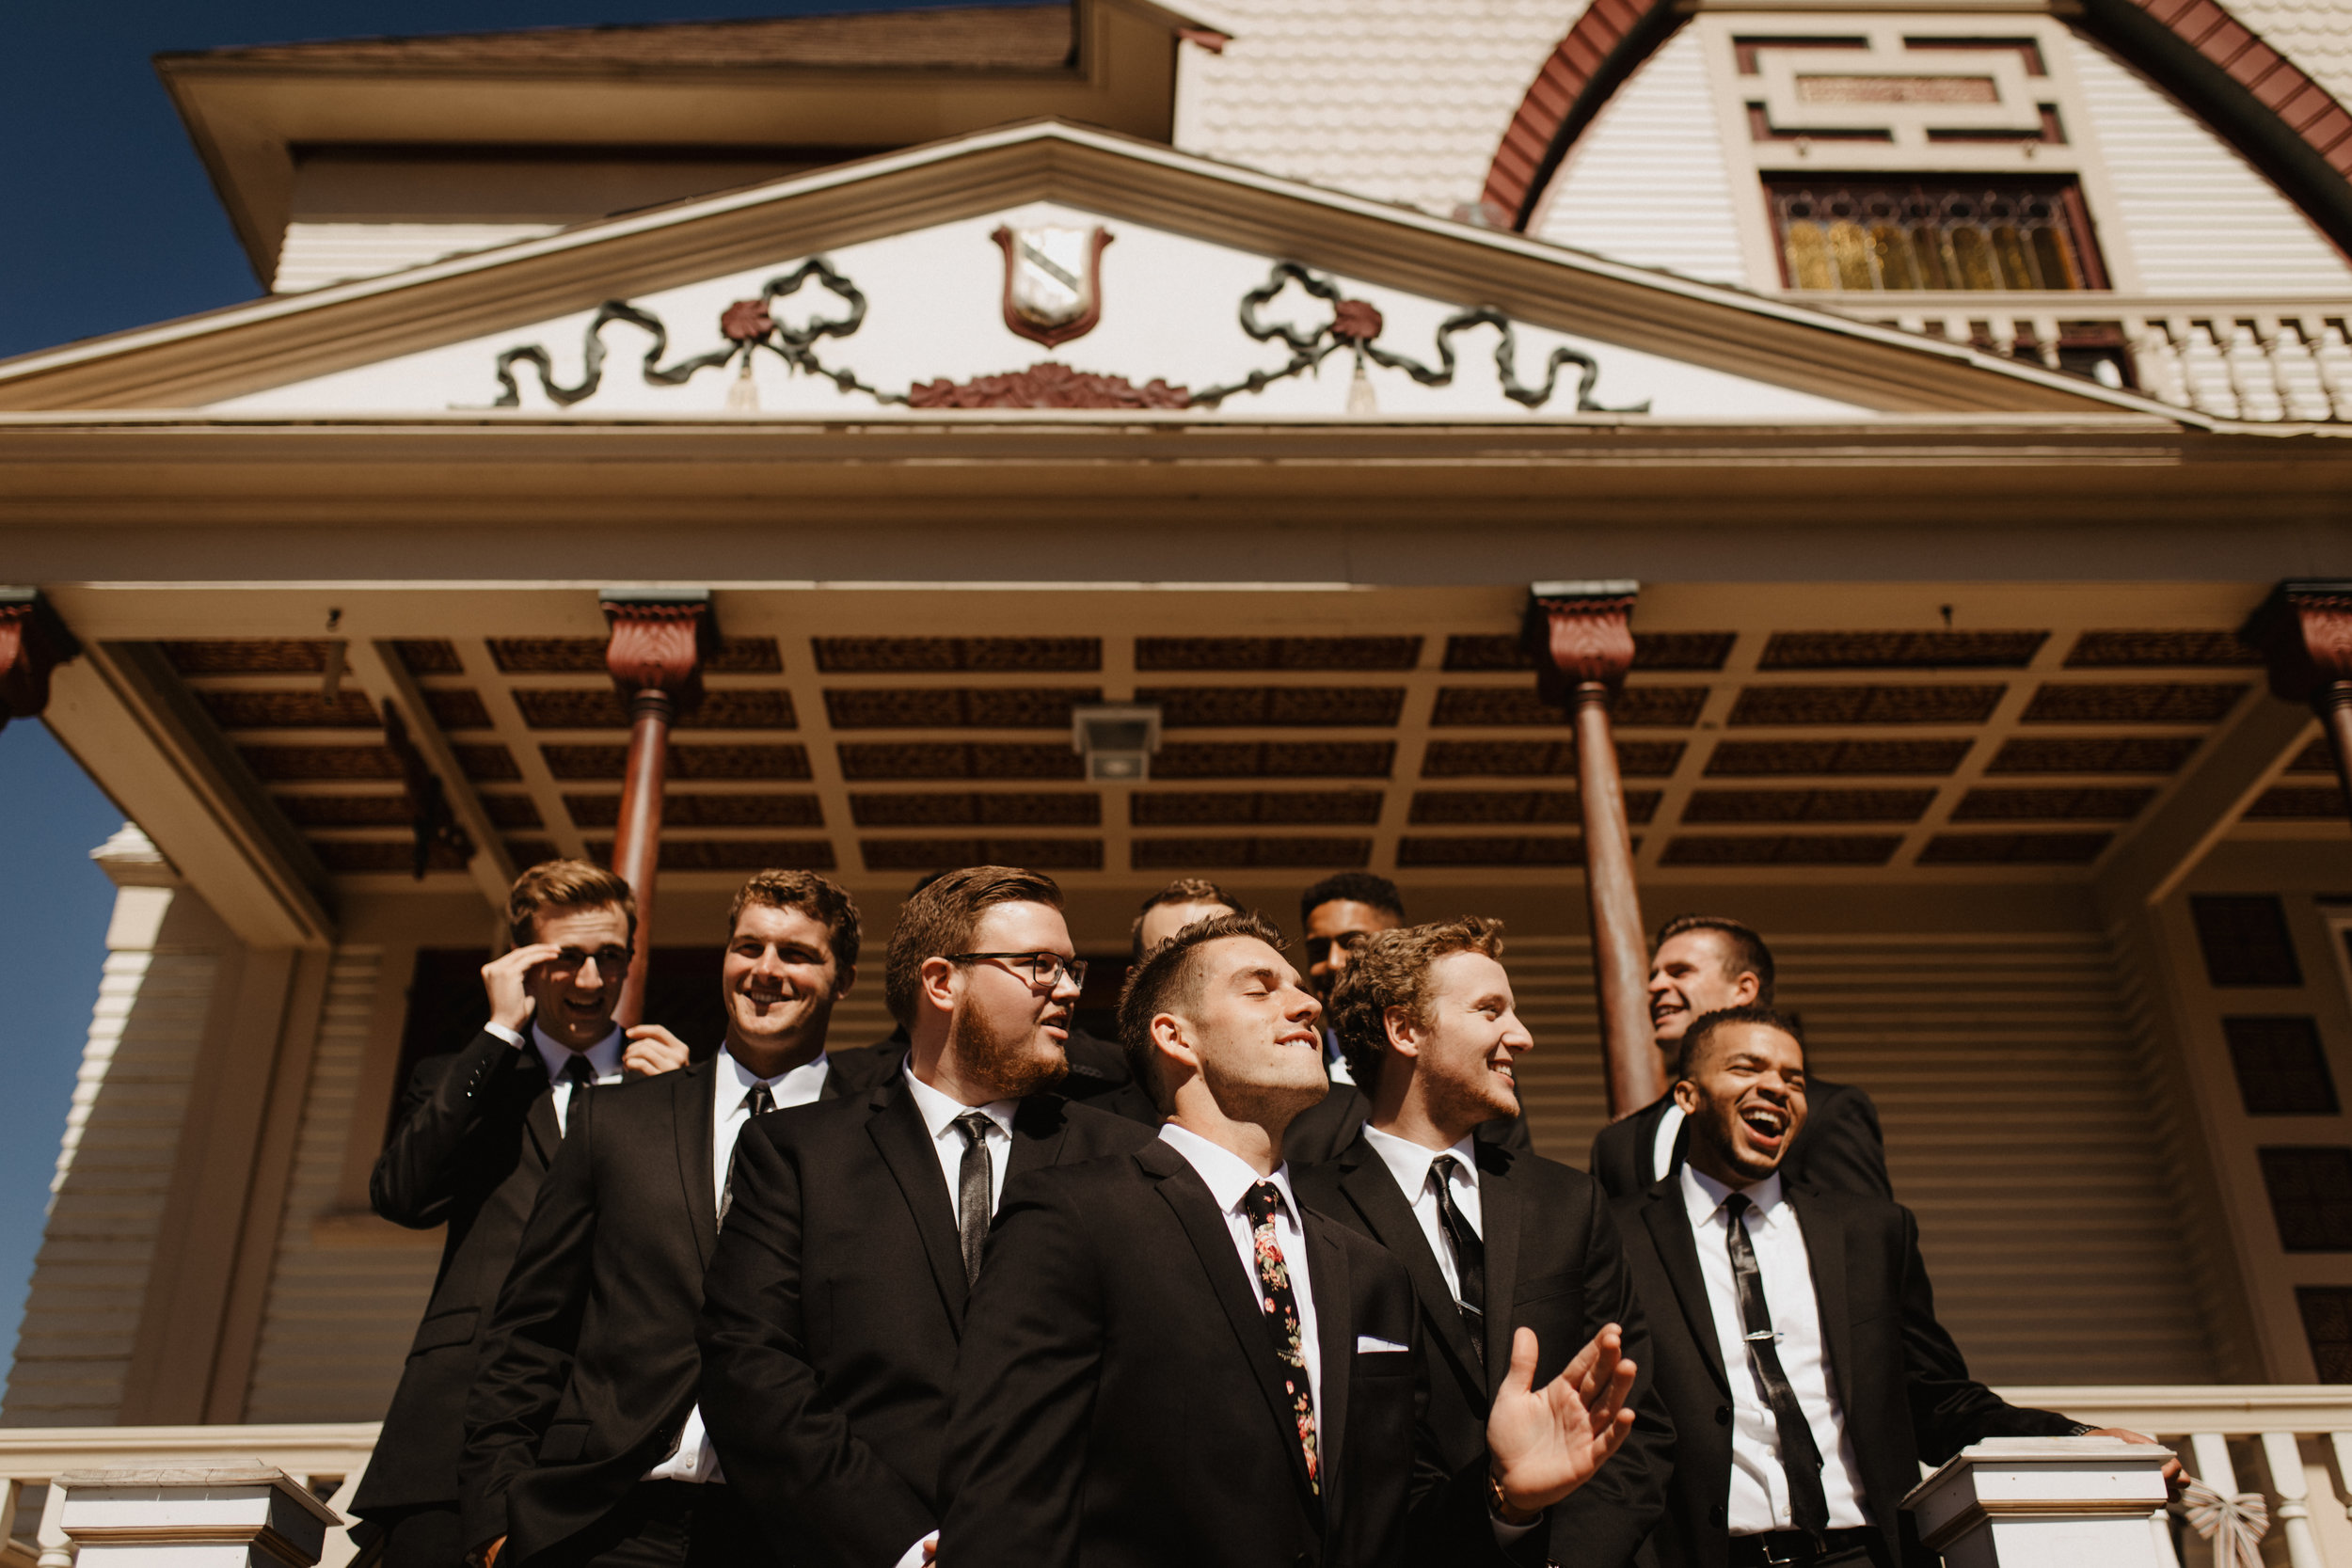 Old-House-Wedding-Photos-Groomsmen-01